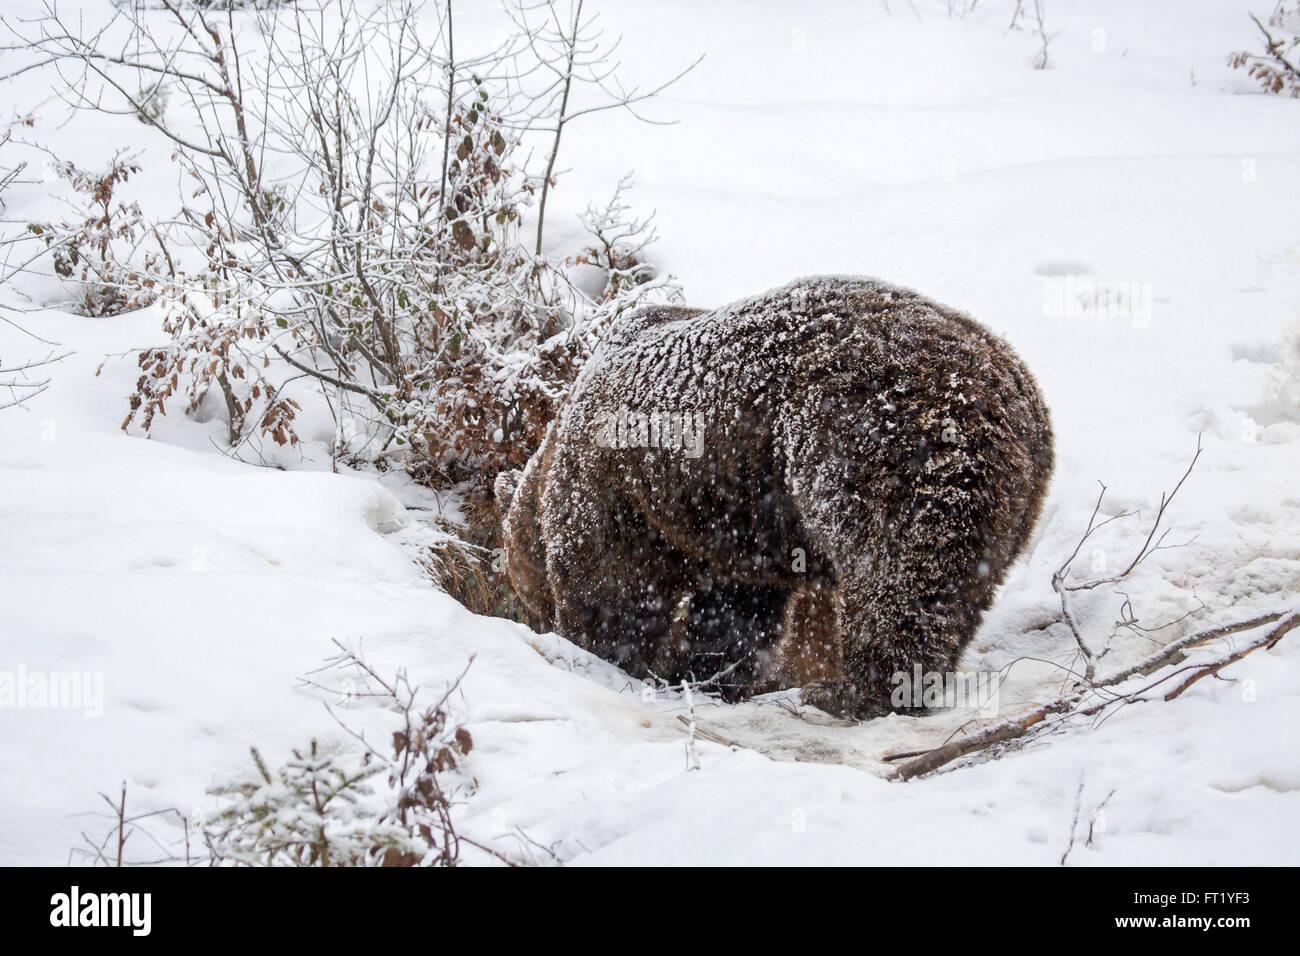 Brown bear (Ursus arctos) entering den during snow shower in autumn / winter - Stock Image